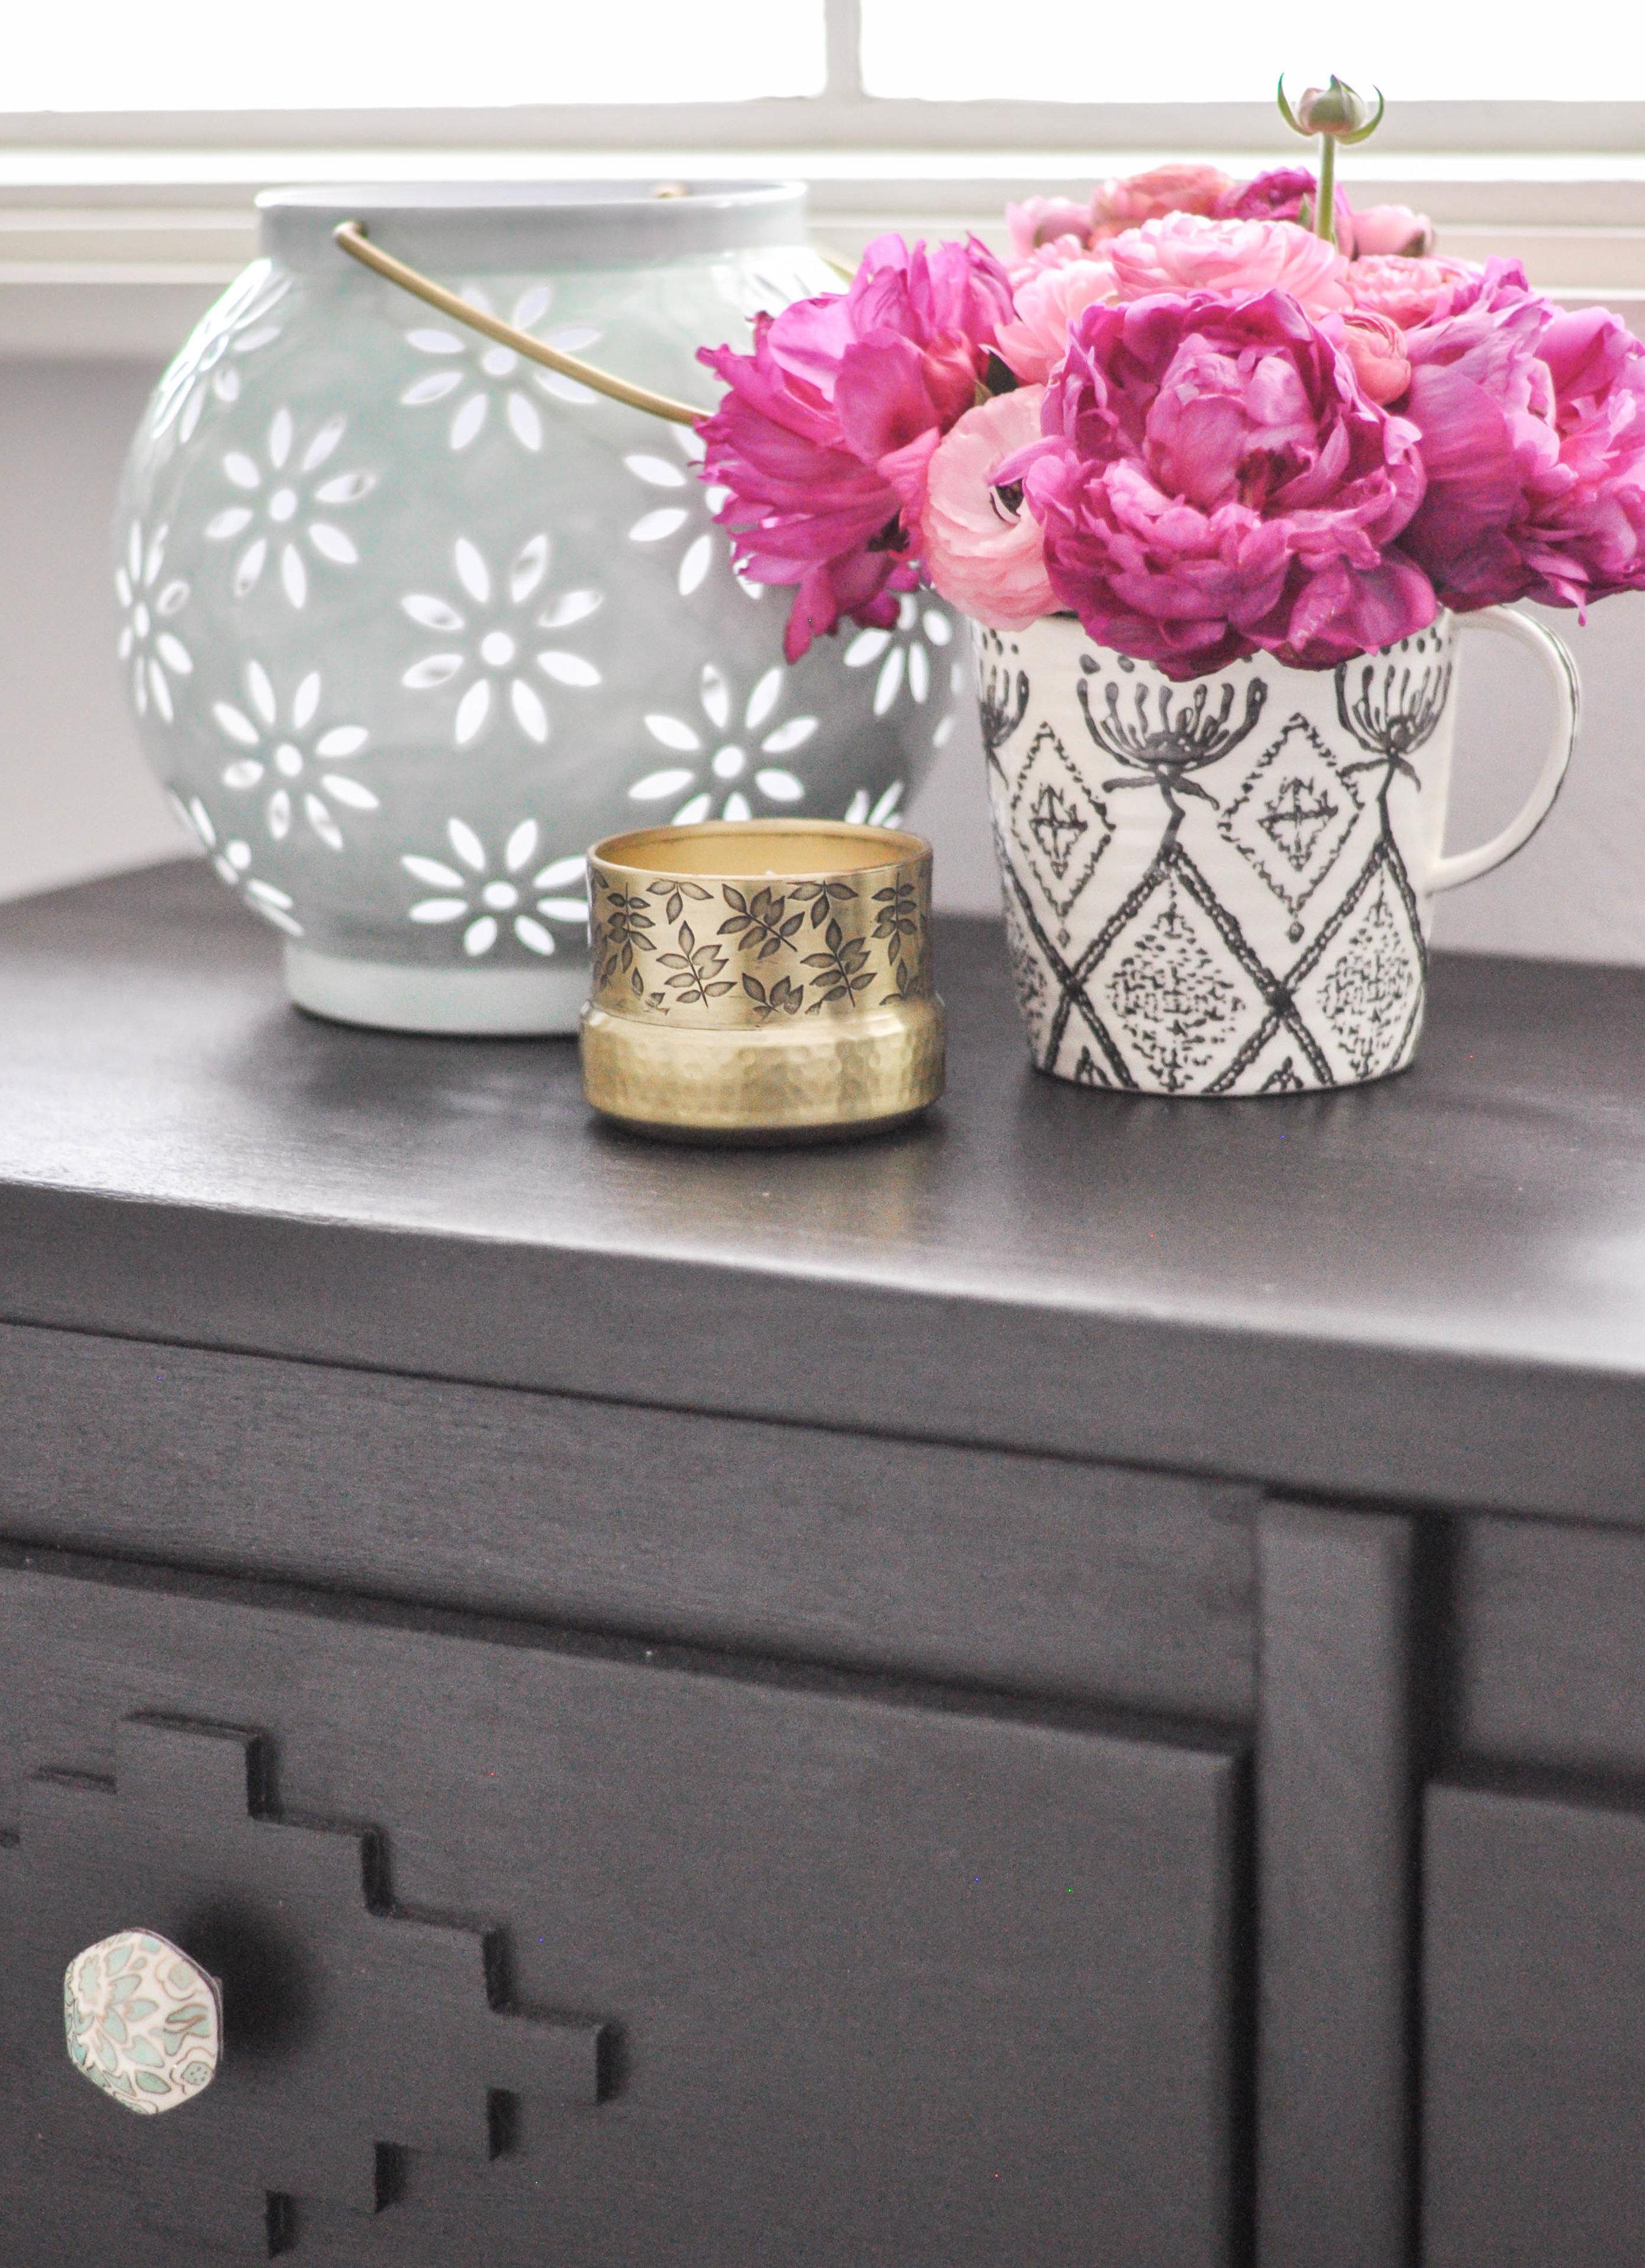 styled dark wood dresser with pink flowers